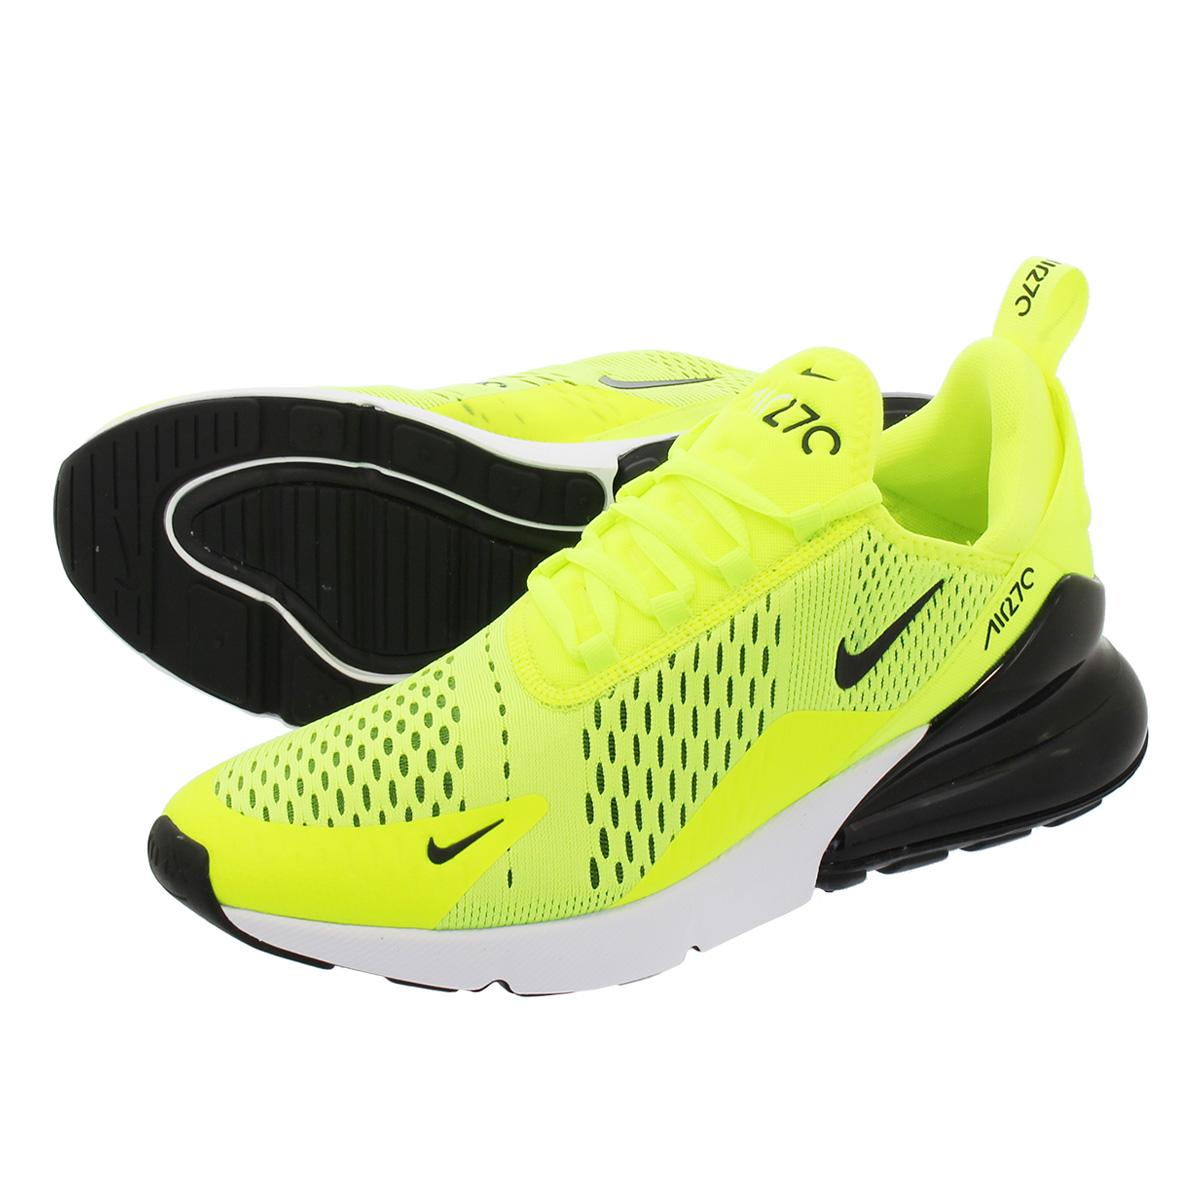 150740e8bed2a Men's Shoes Nike Air Max 270 Volt Black Dark Grey White Neon Yellow  AH8050-701 Sz ...